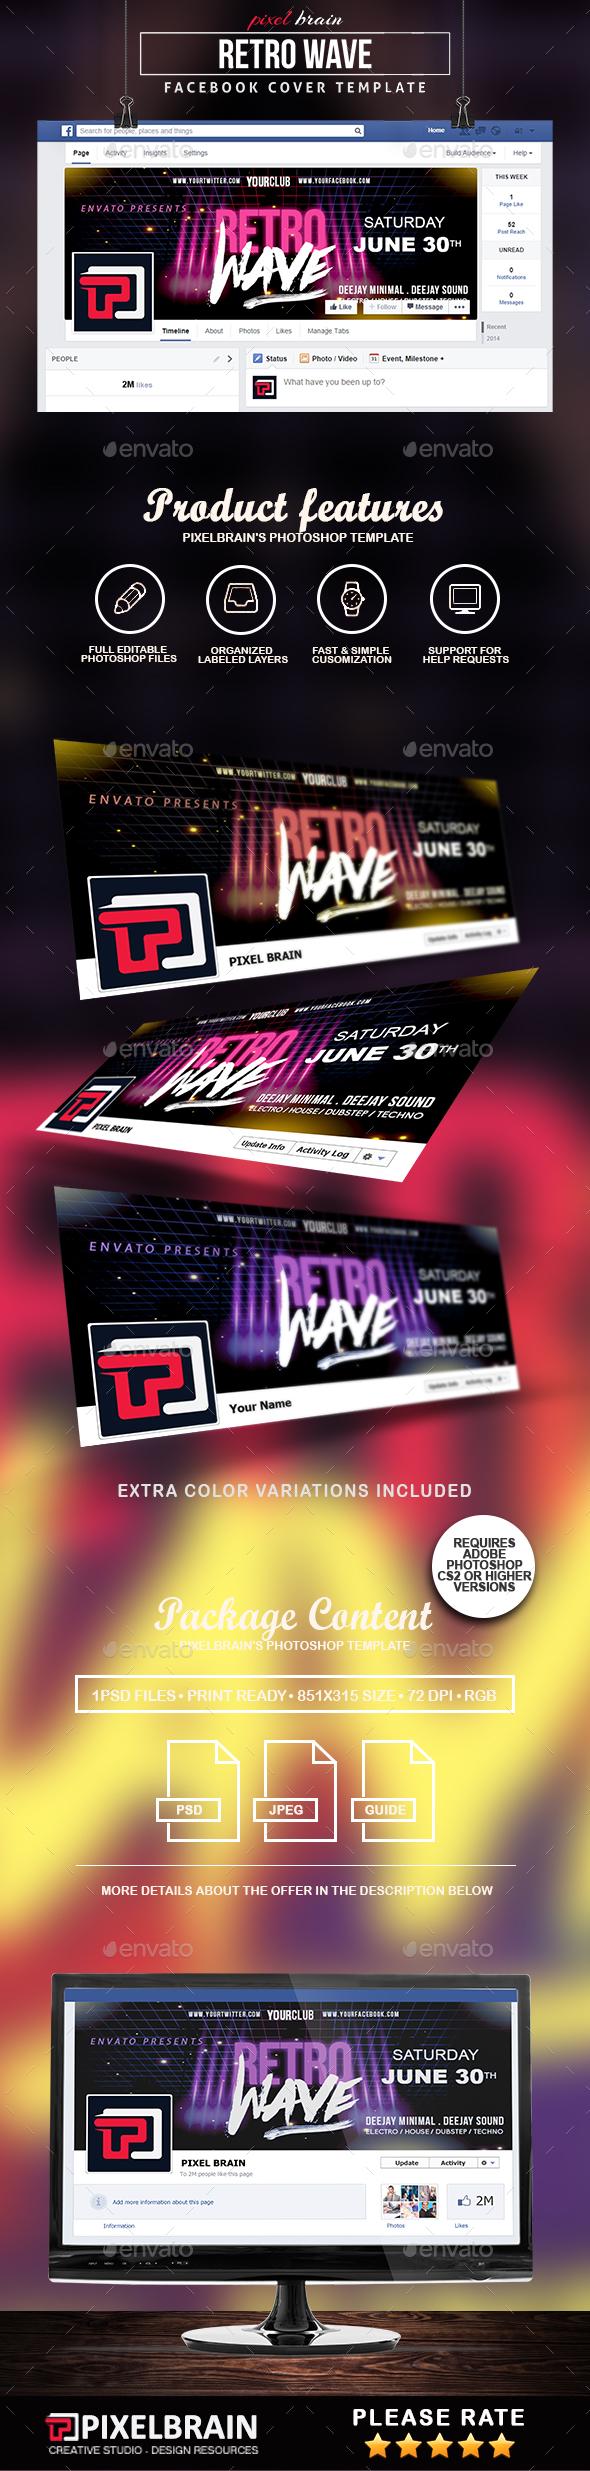 Retro Wave Facebook Cover Templates By Pixelbraincs Graphicriver